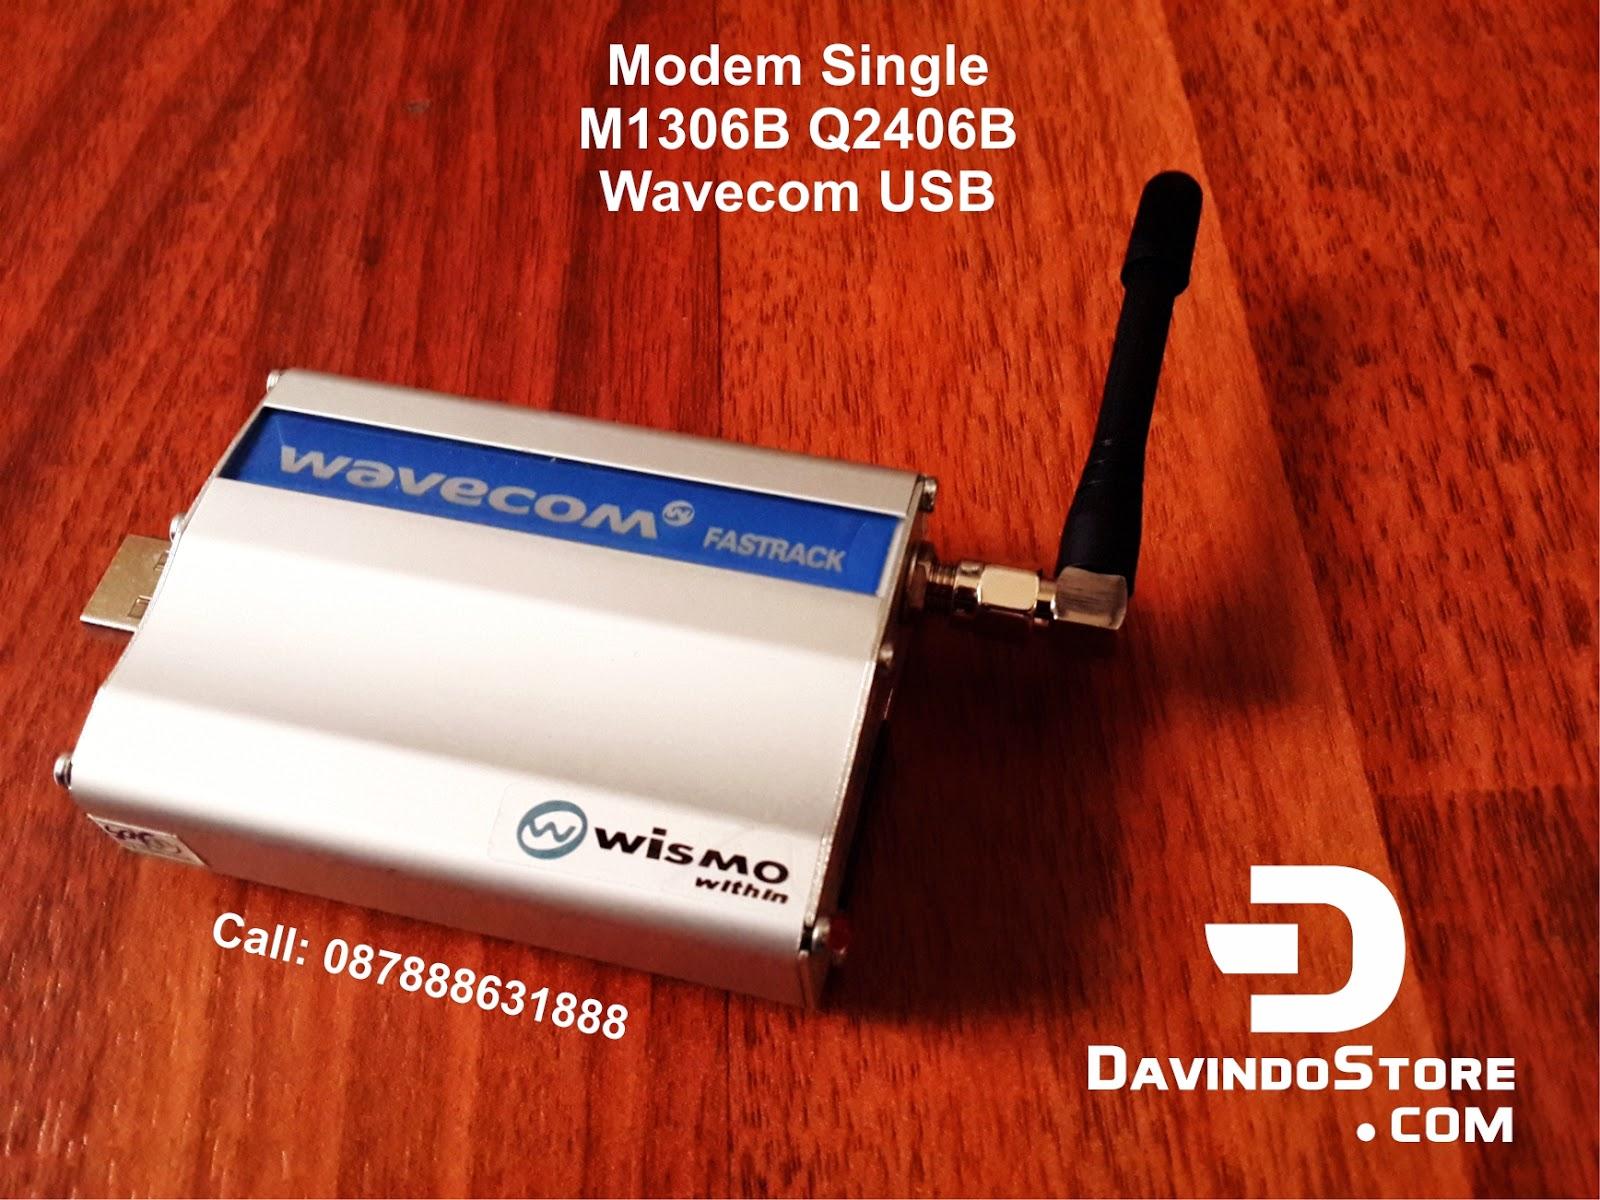 Jual Modem Pool 8 Port Dan 16 Jakarta Murah Berkualitas Wavecom M1306b Usb Q2406b Untuk Server Pulsa Single